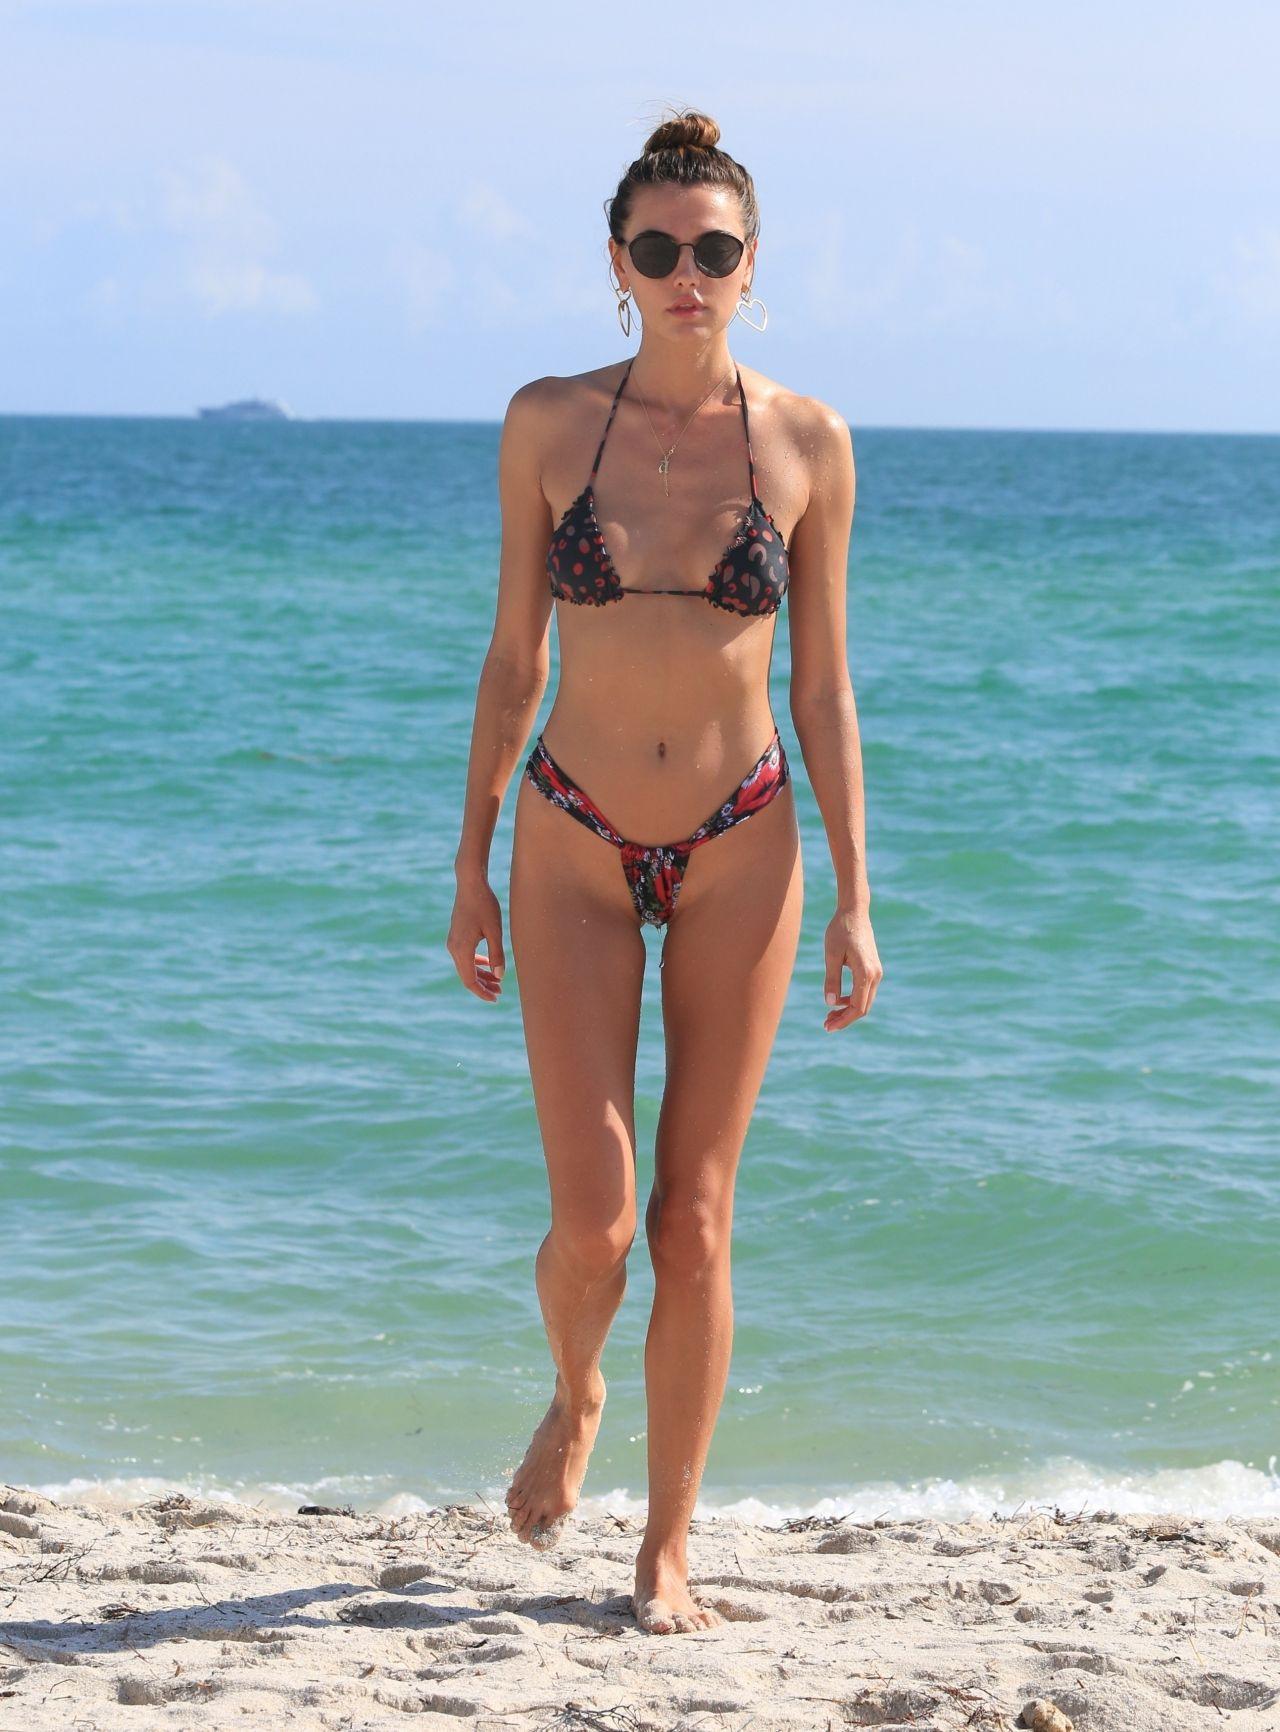 Alina Baikova Hot In Bikini On The Beach In Miami-9188